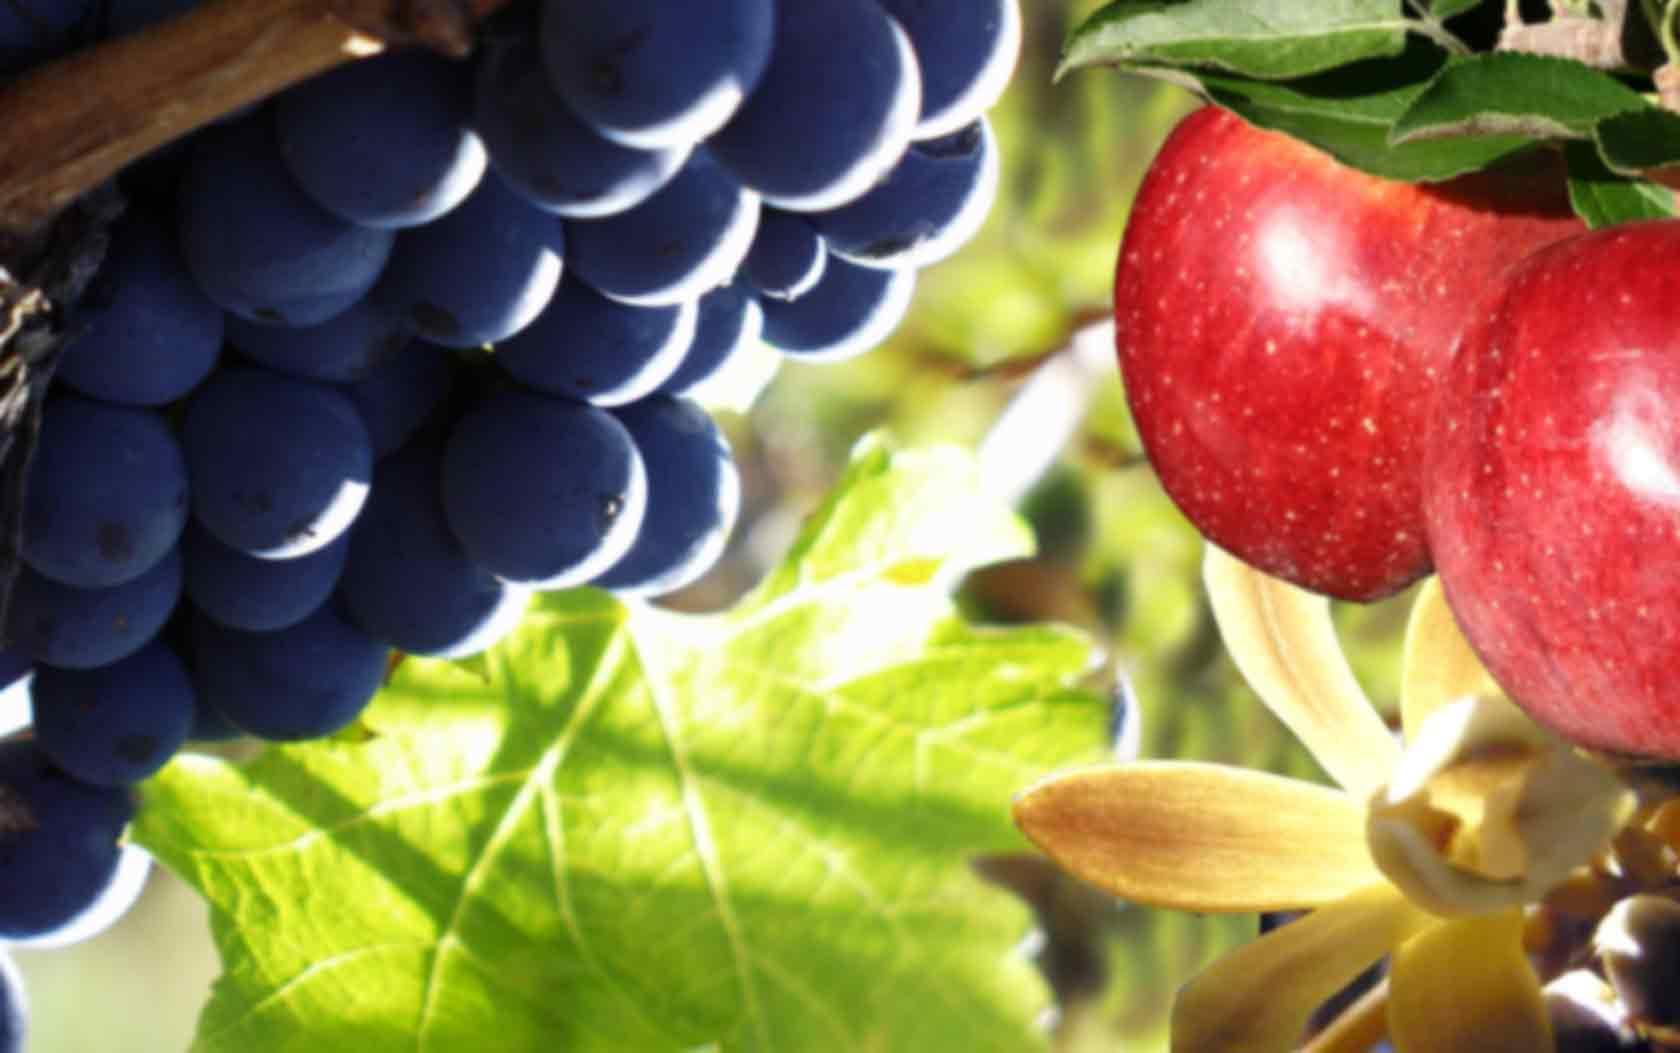 stanthorpe accommodation wineries and restaurants icaredatatools